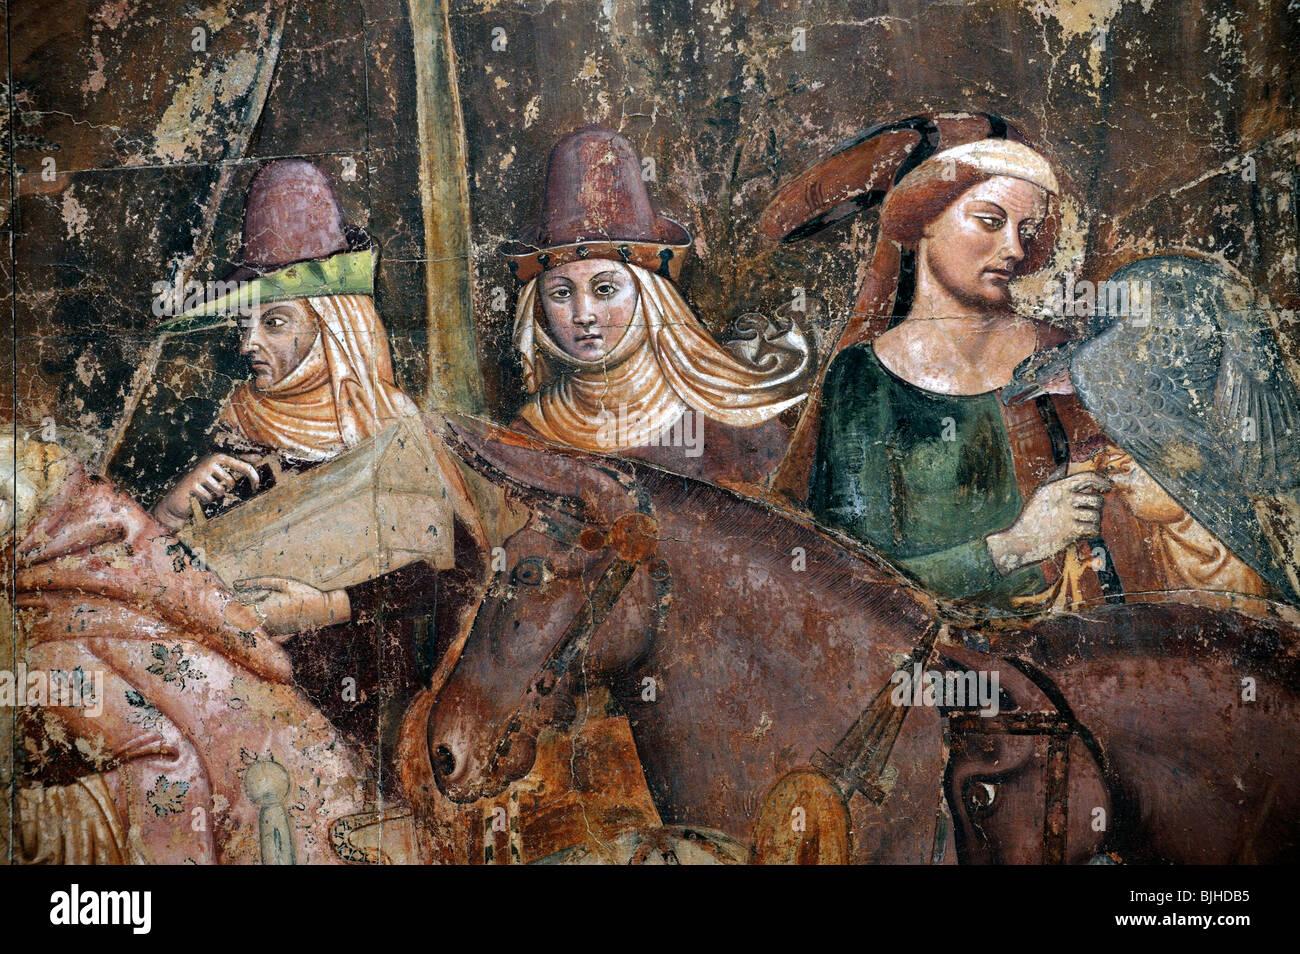 Detalle del 14 C El triunfo de la muerte de di Martino Bonamico da Firenze, Buffalmacco, en el camposanto, Pisa, Imagen De Stock